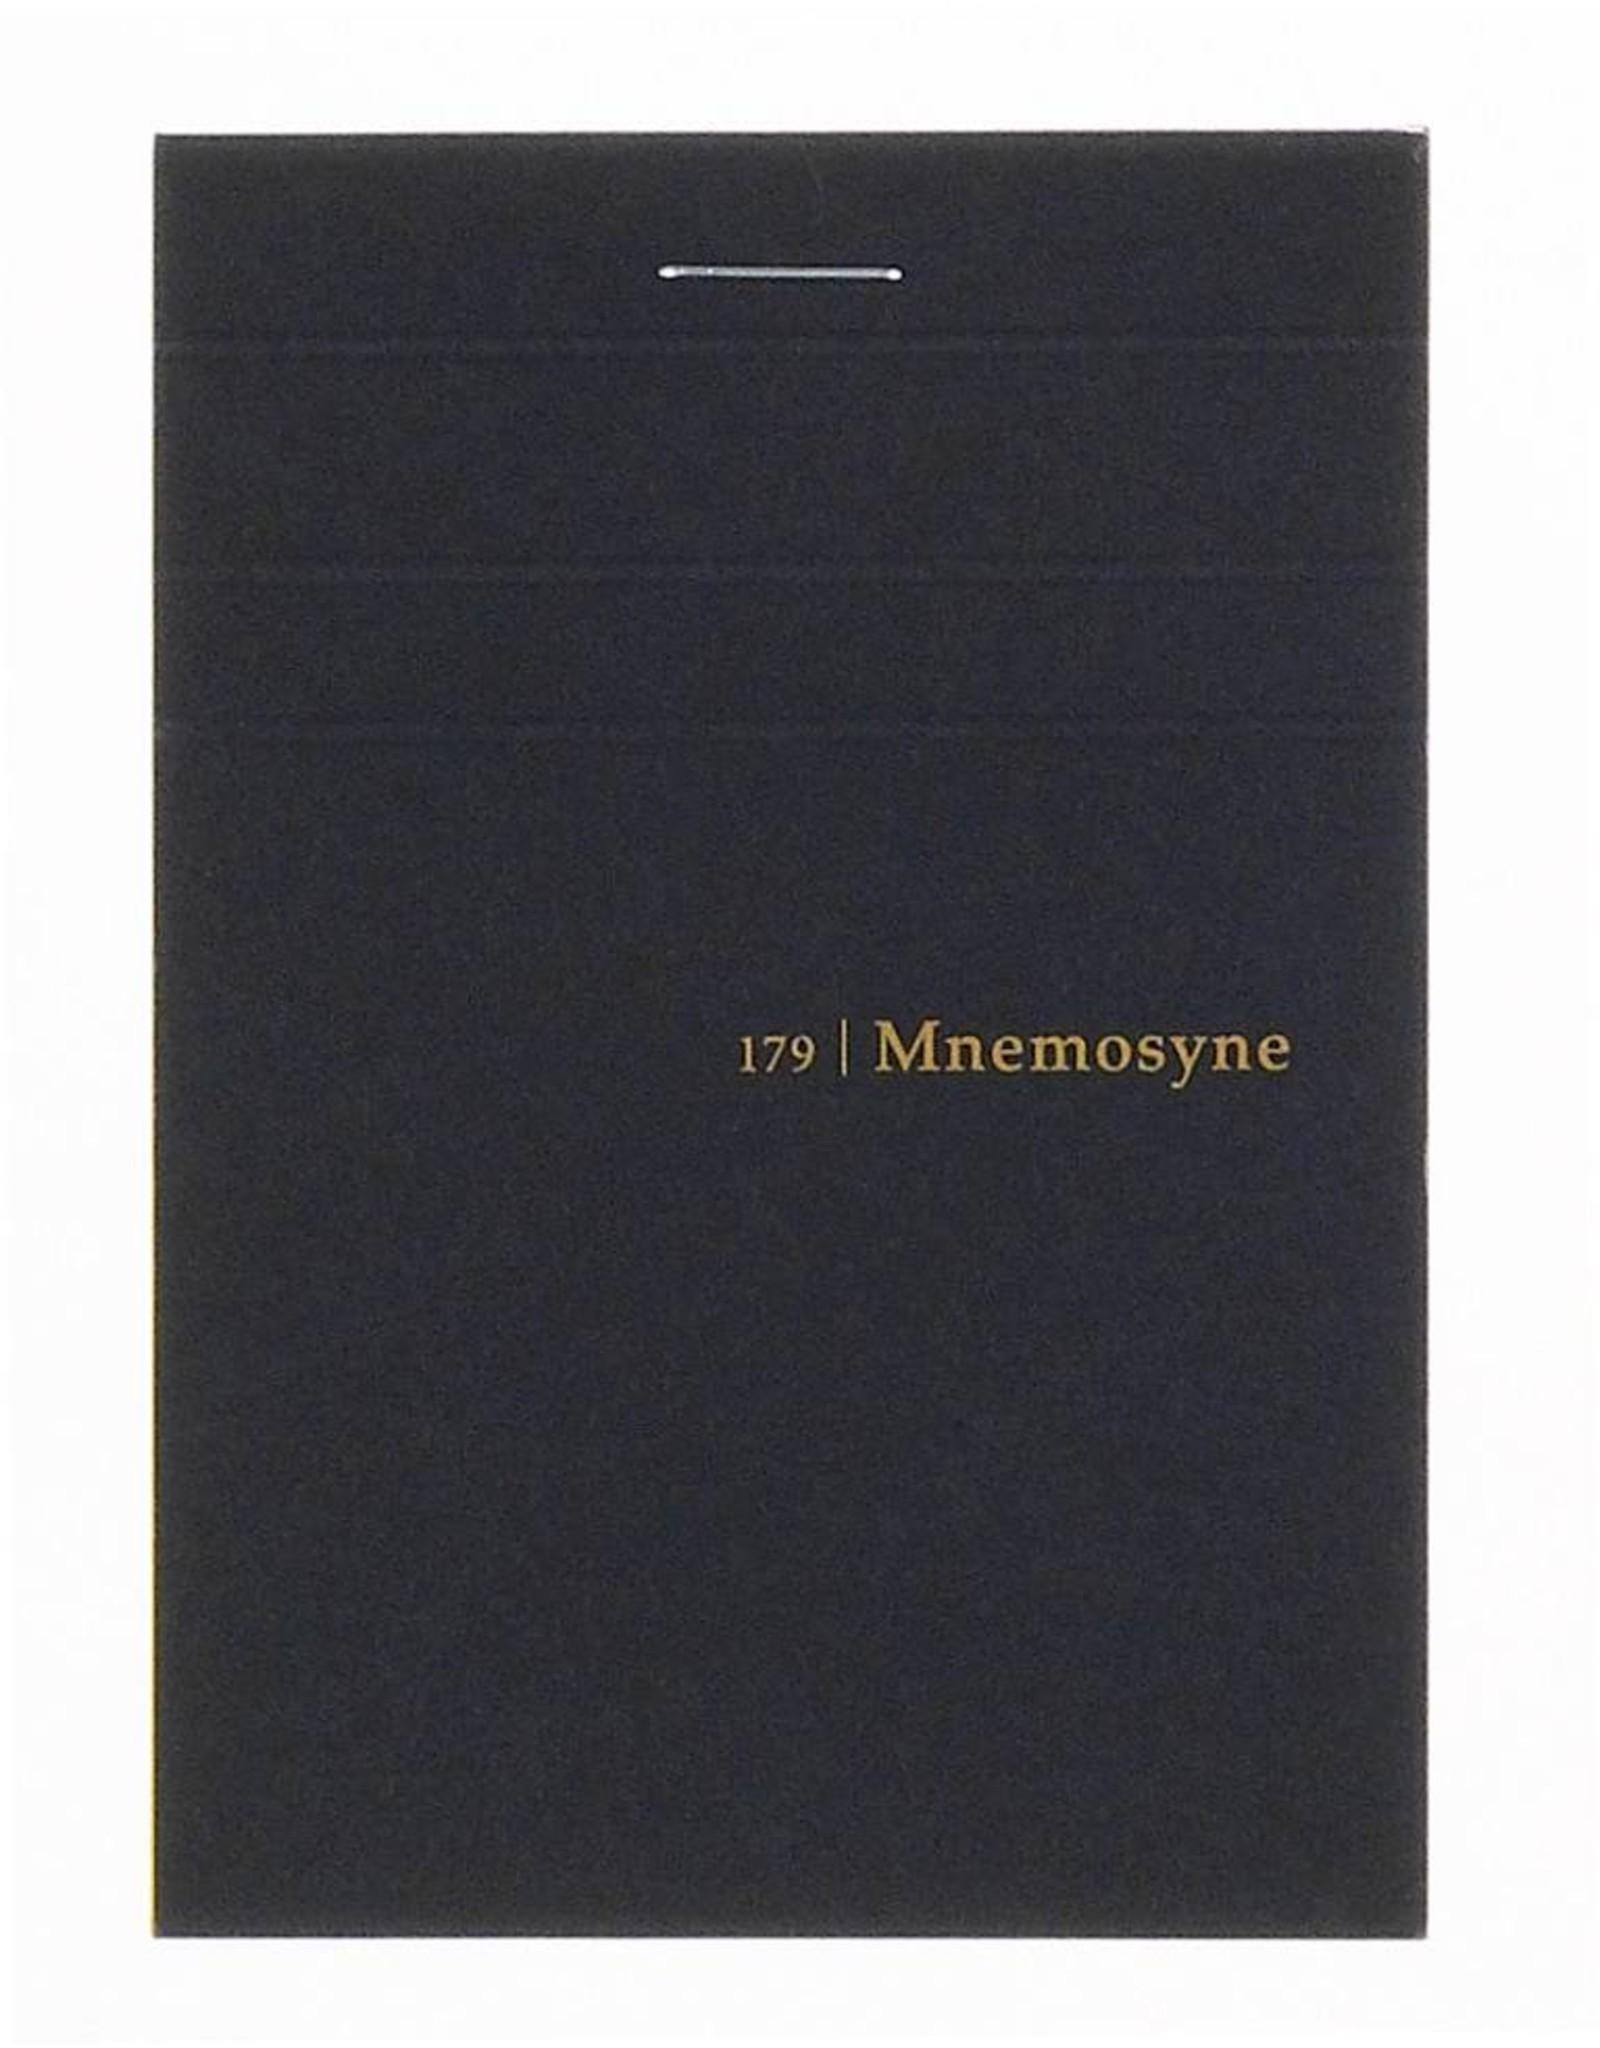 MARUMAN N179A MNEMOSYNE MEMO 5MM SQUARED A7